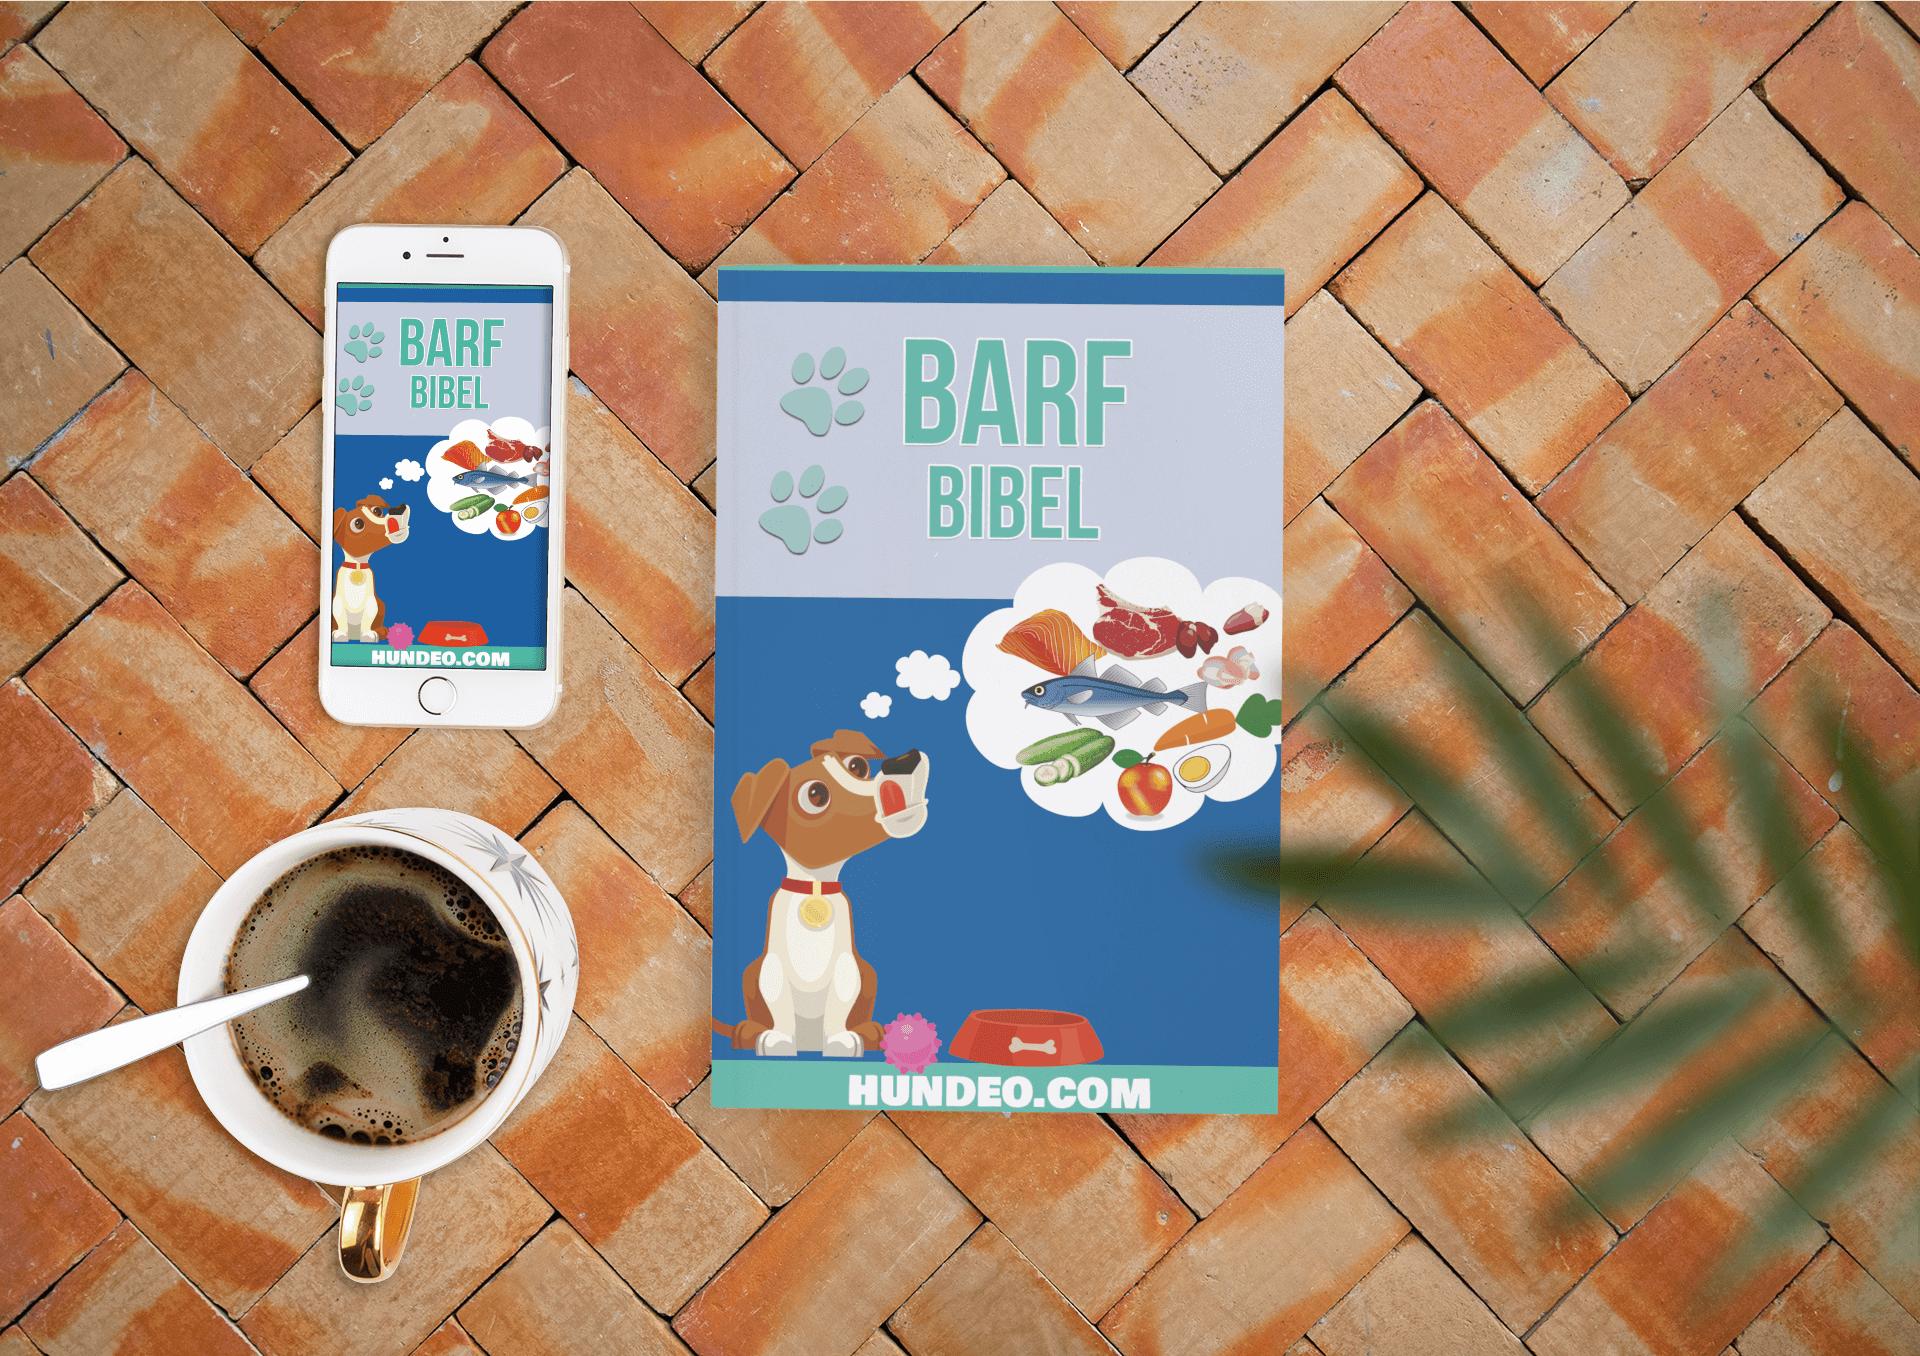 Barf Bibel Partnerprogramm 13